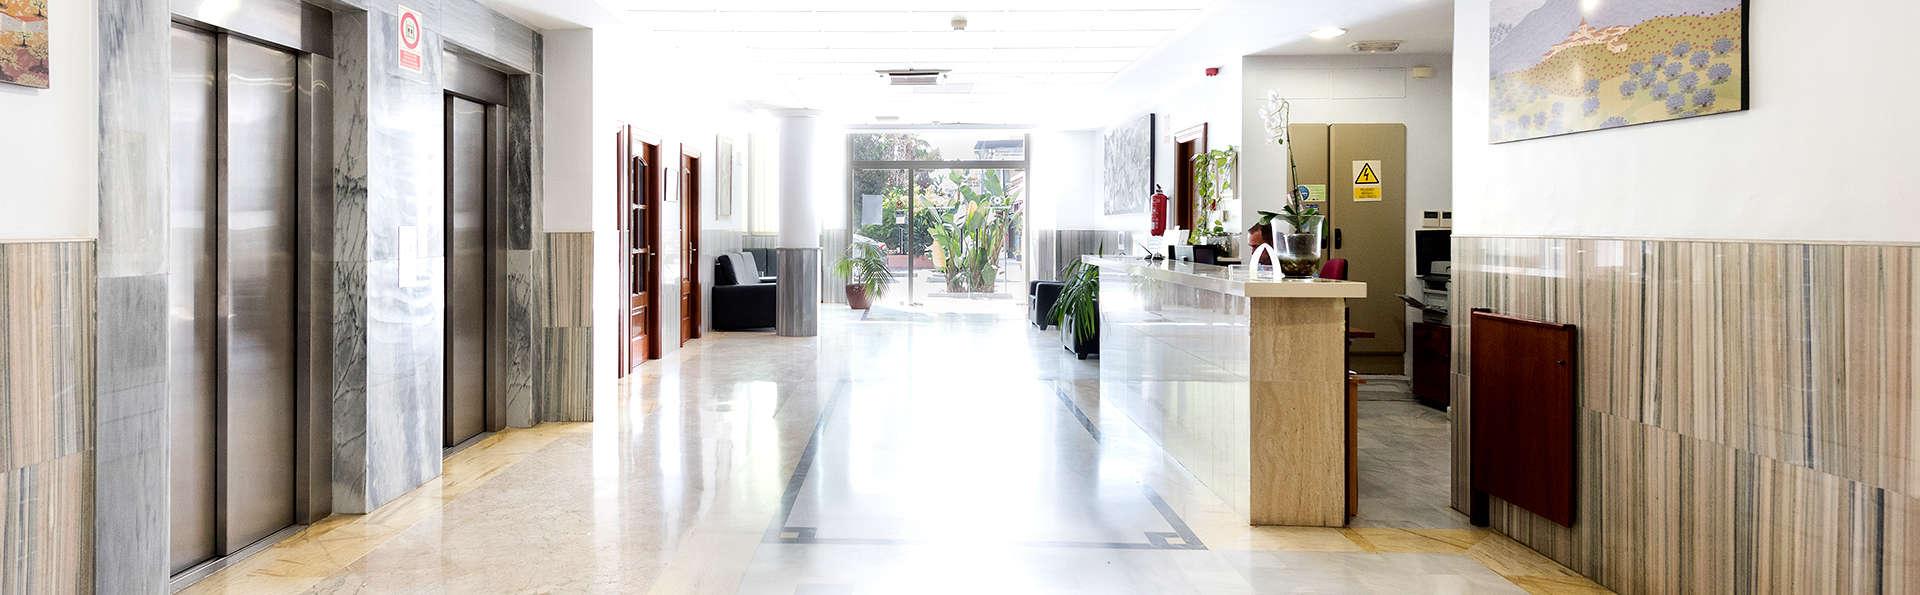 Hotel Toboso Almuñécar - Edit_reception2.jpg